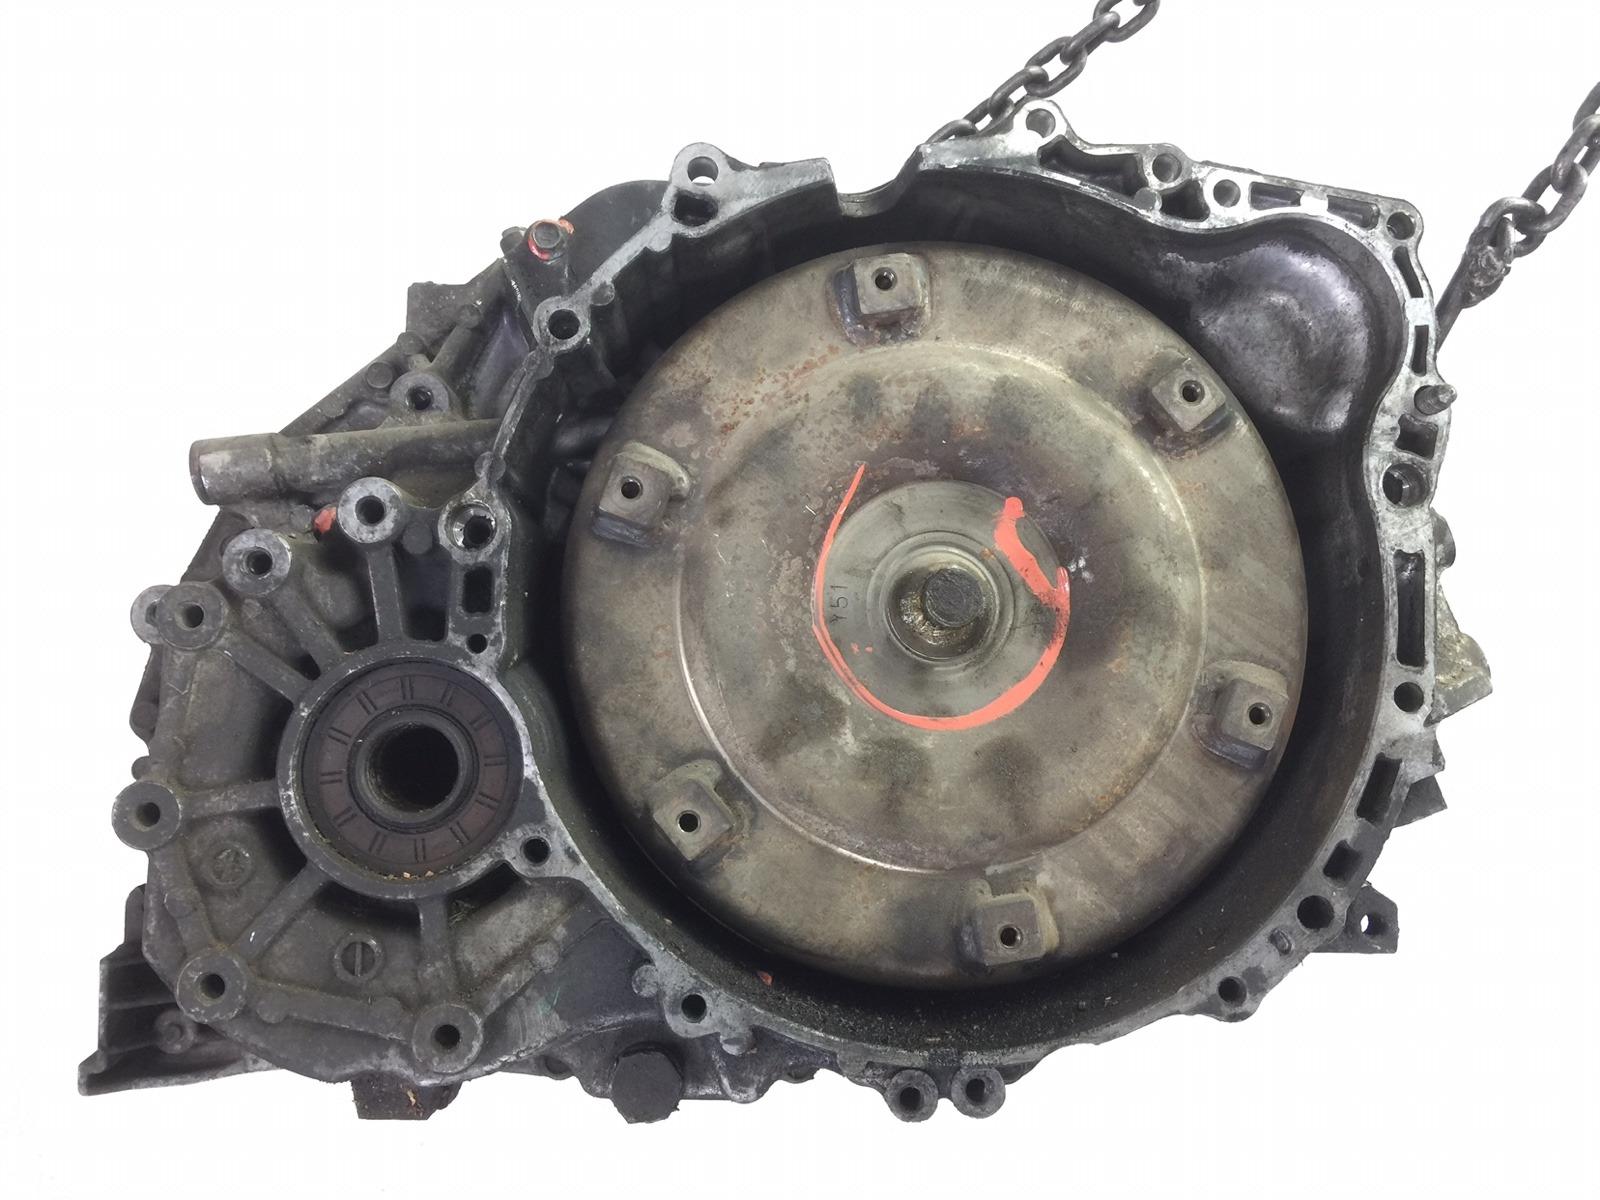 Кпп автоматическая (акпп) Volvo V70 2.4 D5 2002 (б/у)